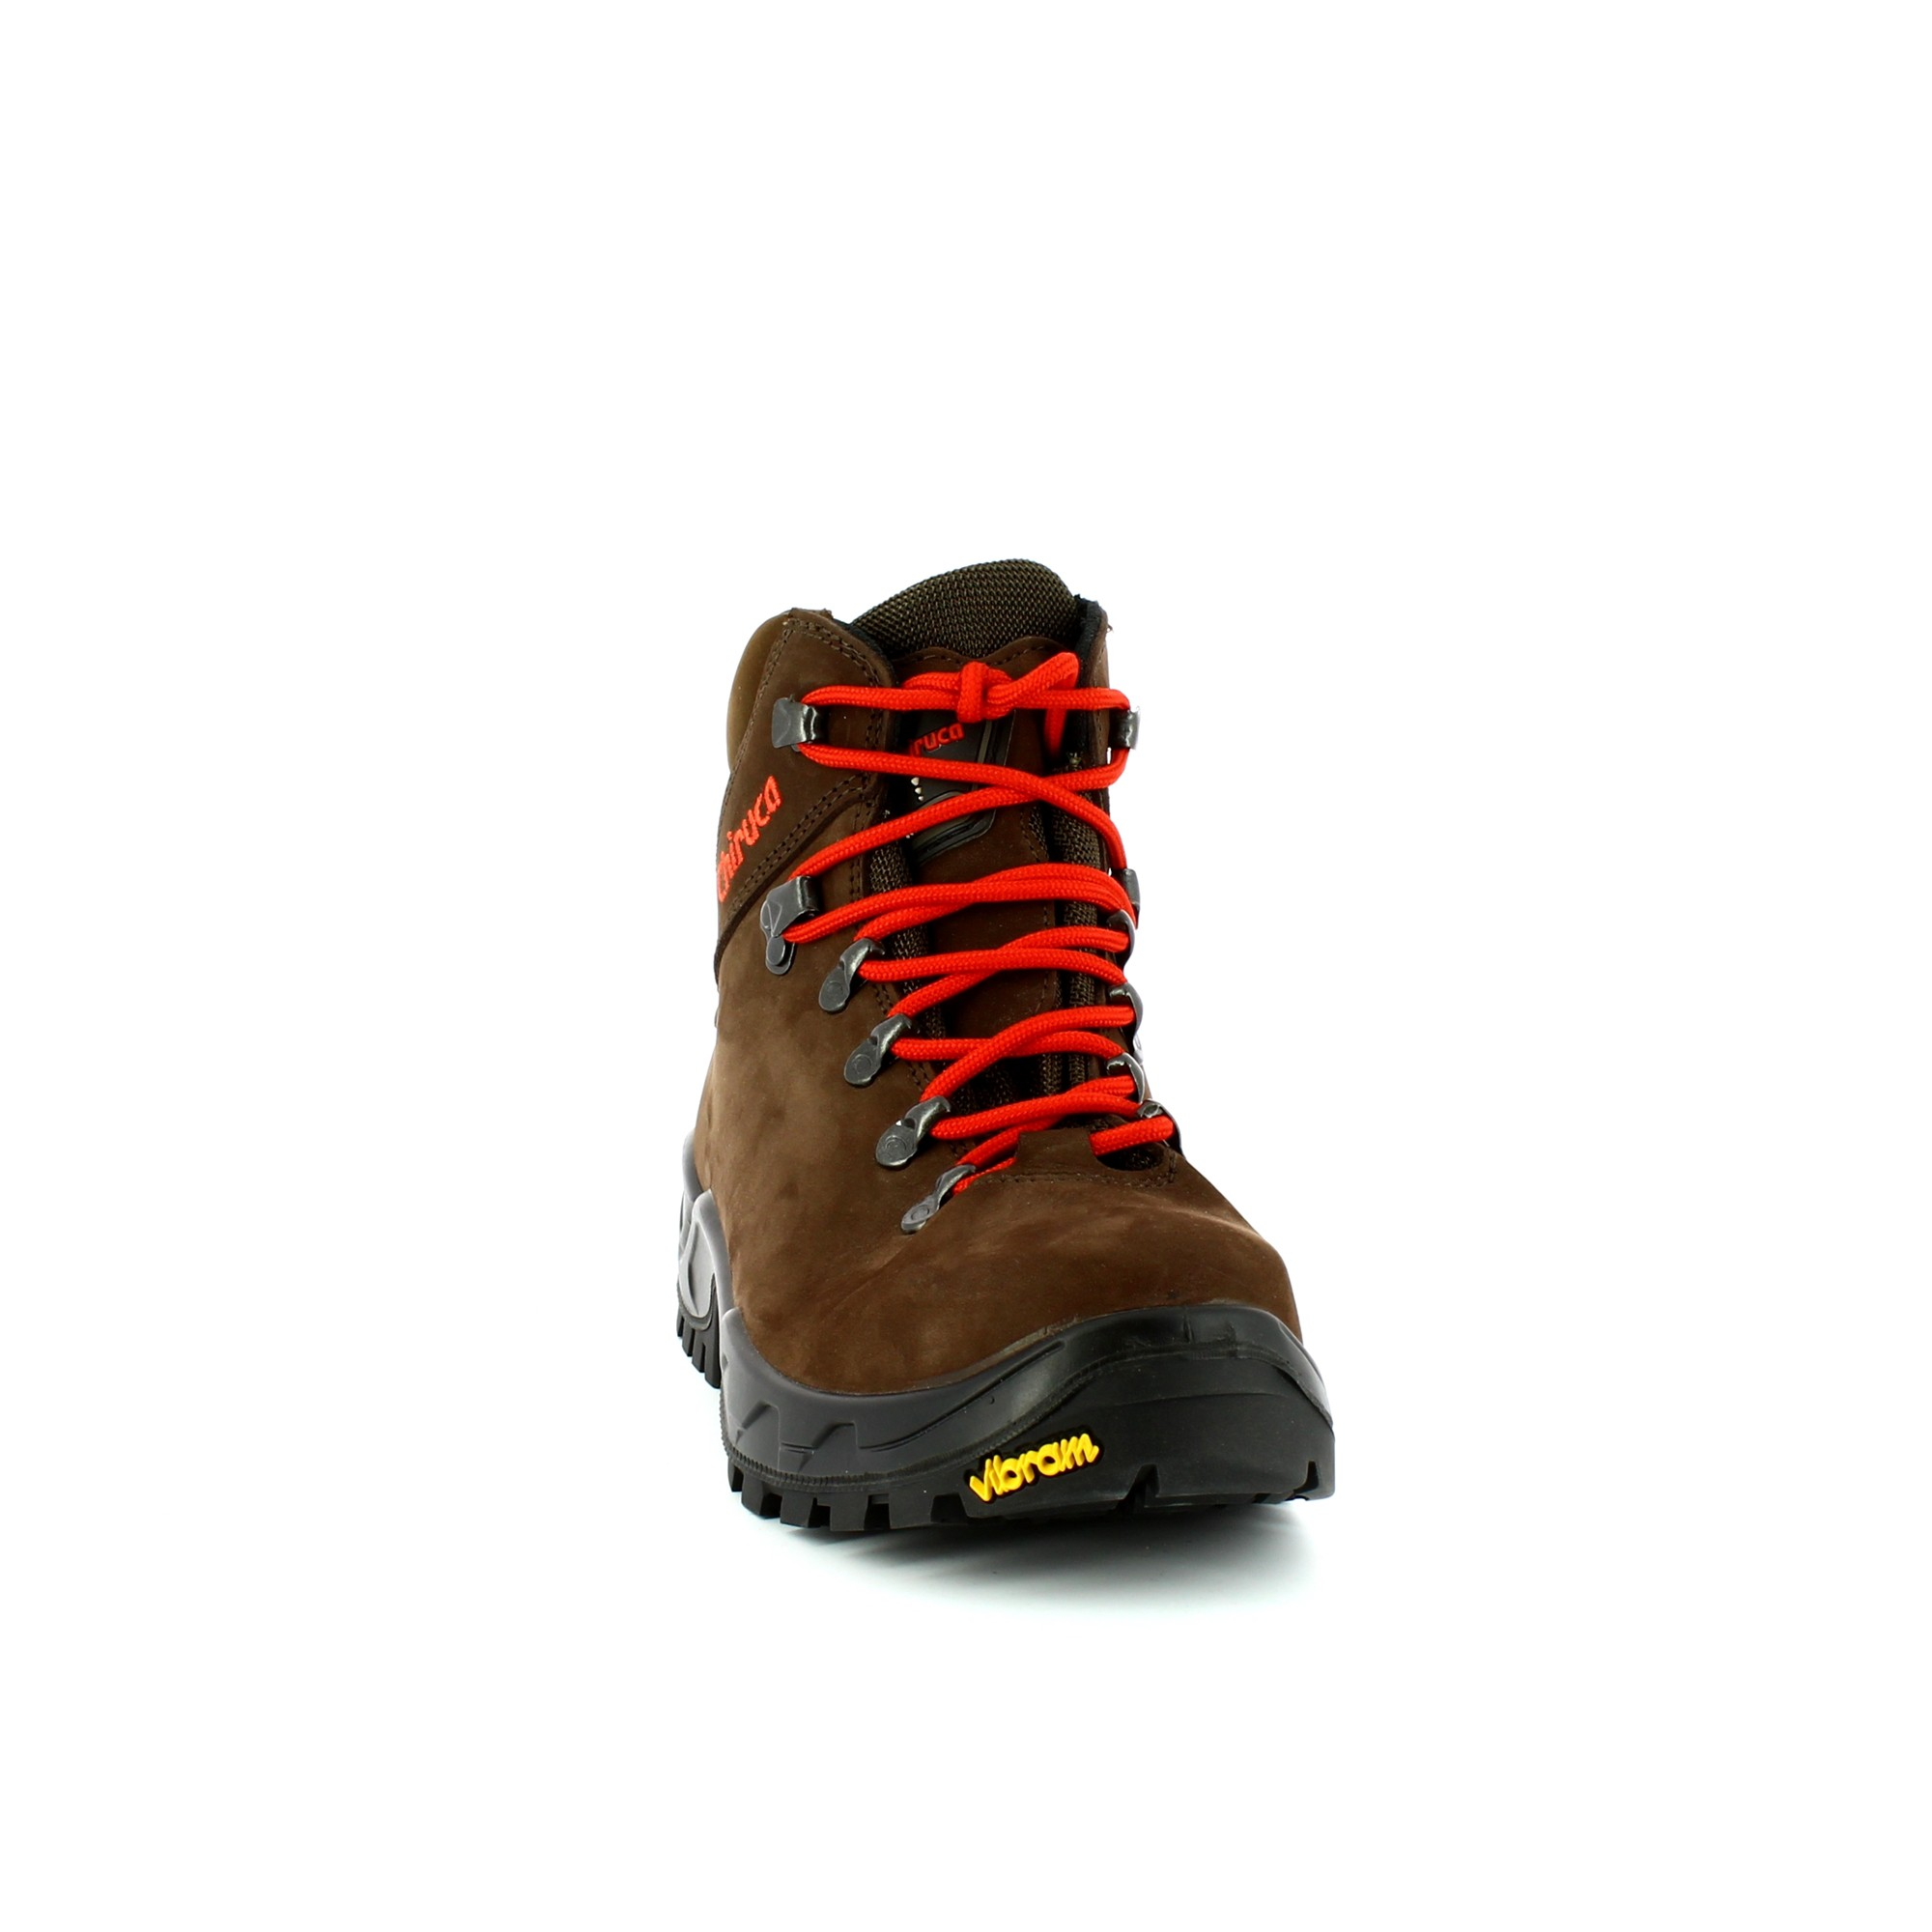 529b33dce47 Botas trekking Chiruca Cares 02 GTX marron hombre - Deportes Moya